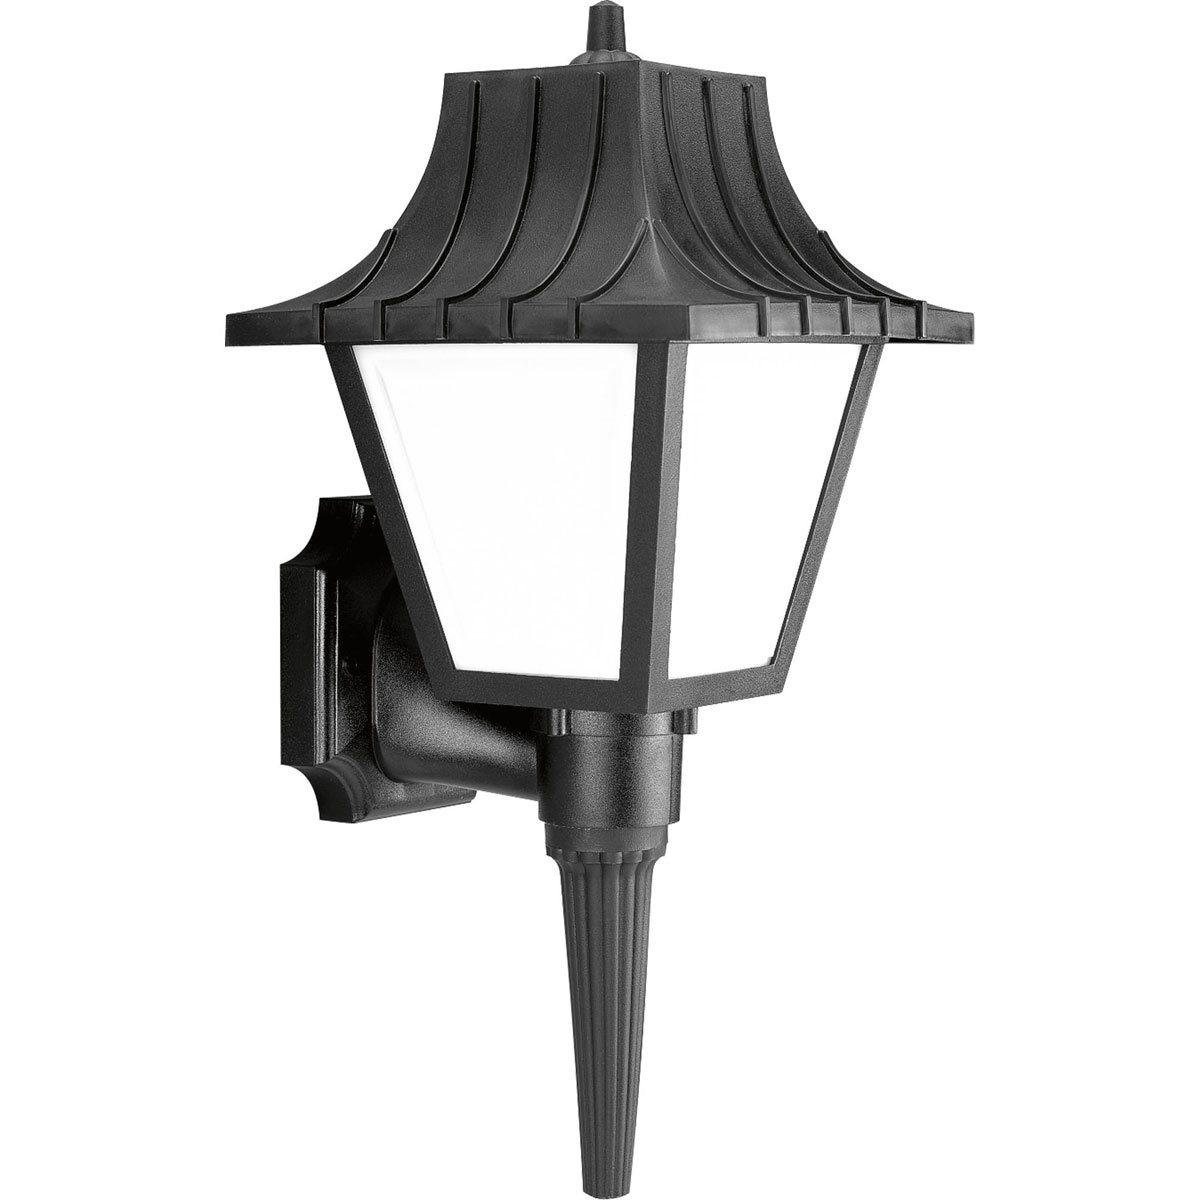 Progress Lighting P5843 Polycarbonate Traditional Outdoor Wall Lantern PG-P5843